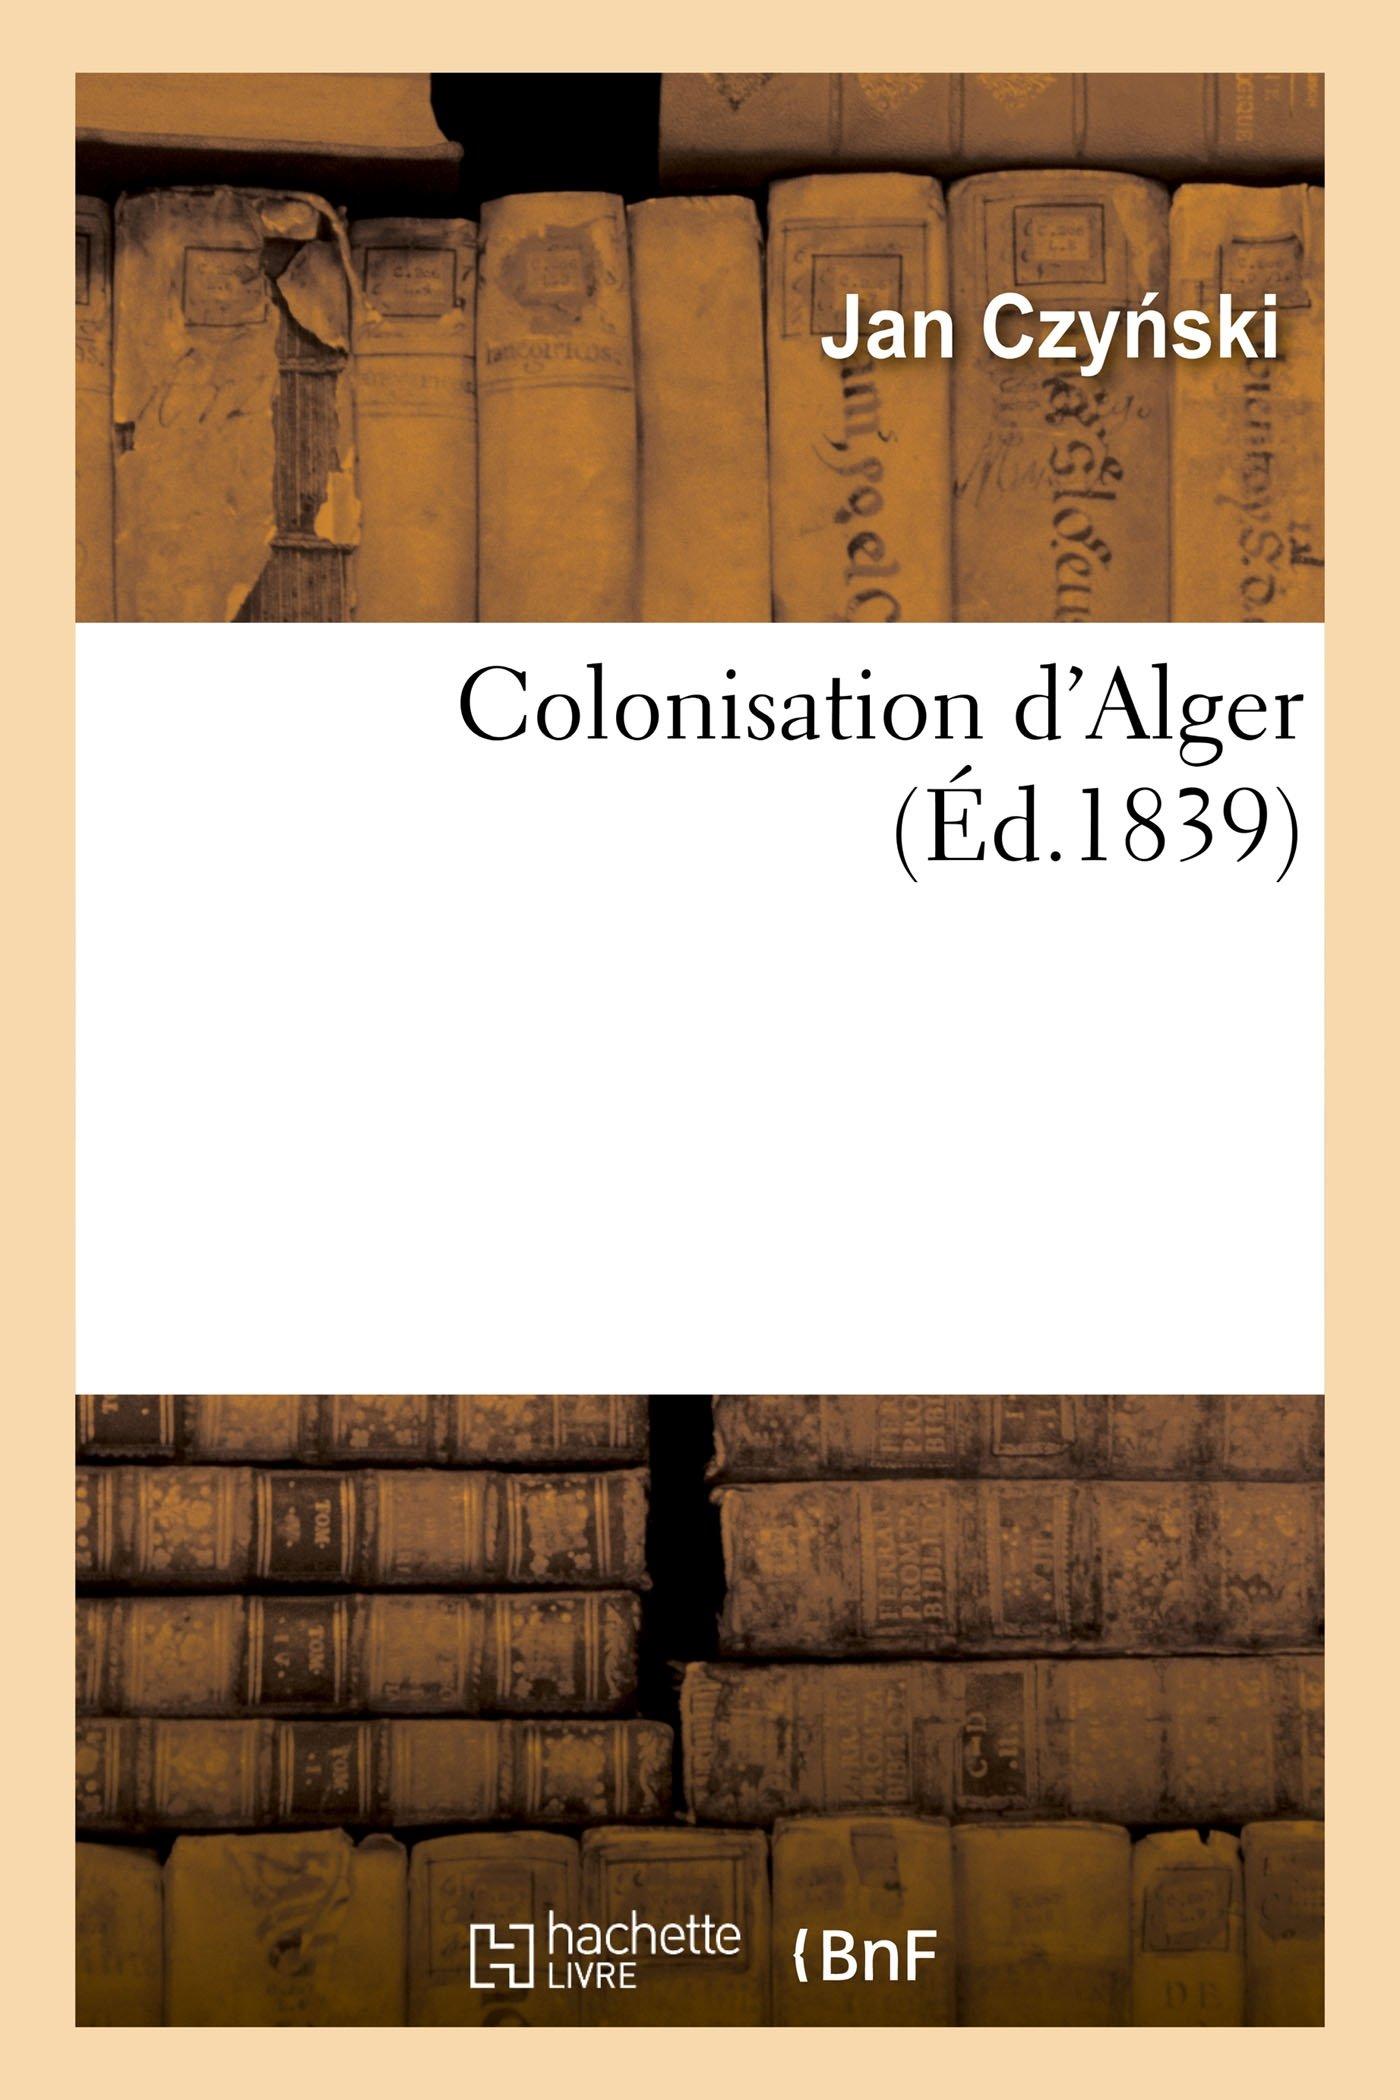 Colonisation d'Alger (Histoire) (French Edition) pdf epub